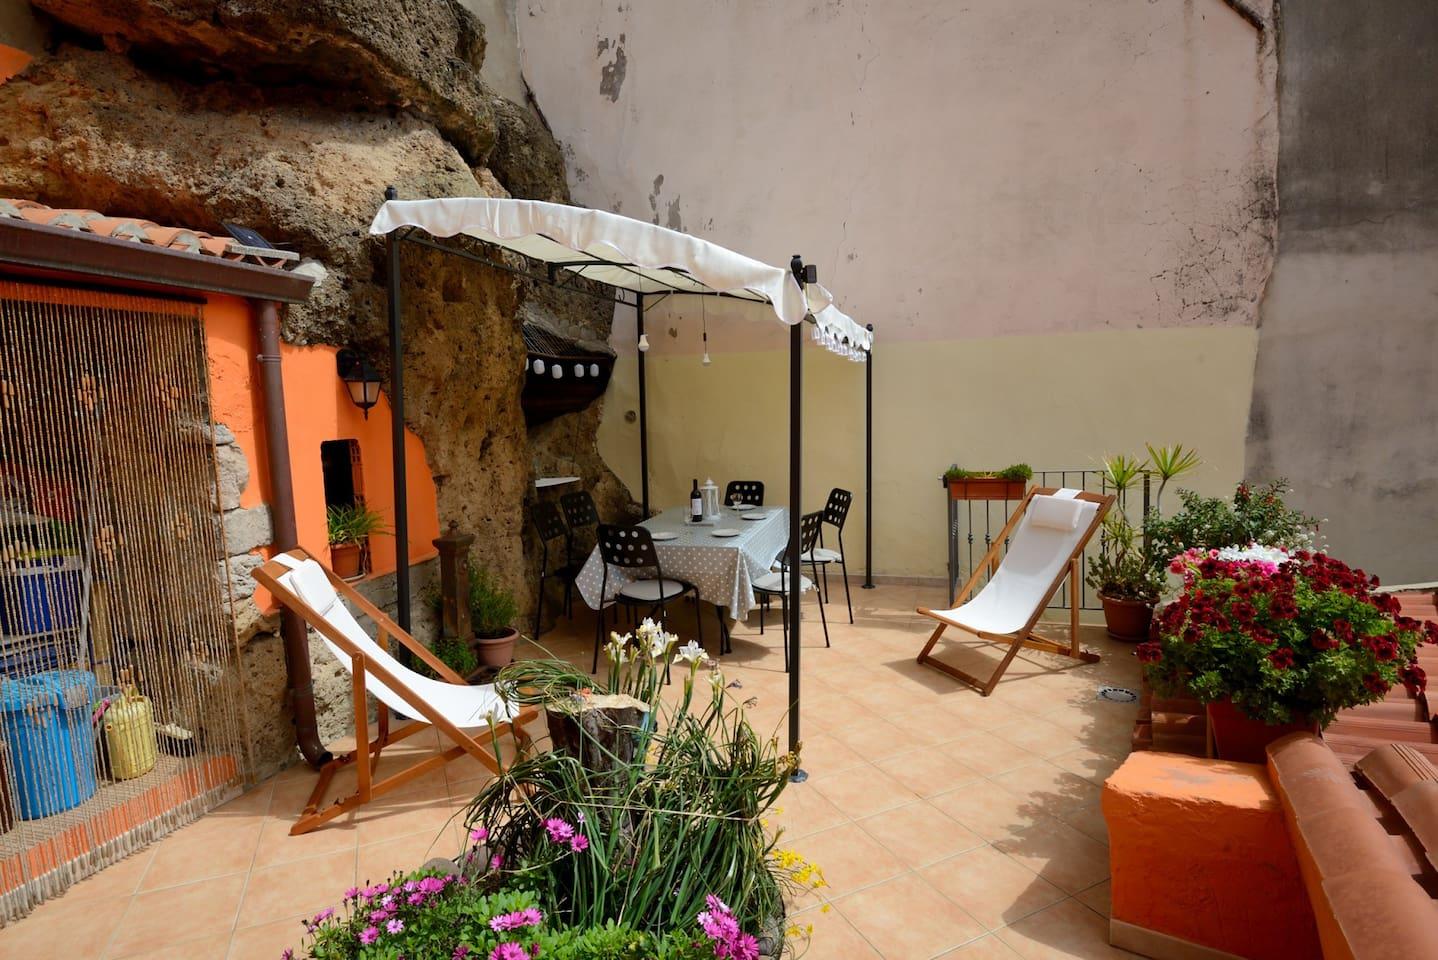 Lemon Tree Terrace Apartment, Bosa - Apartments for Rent in Bosa ...